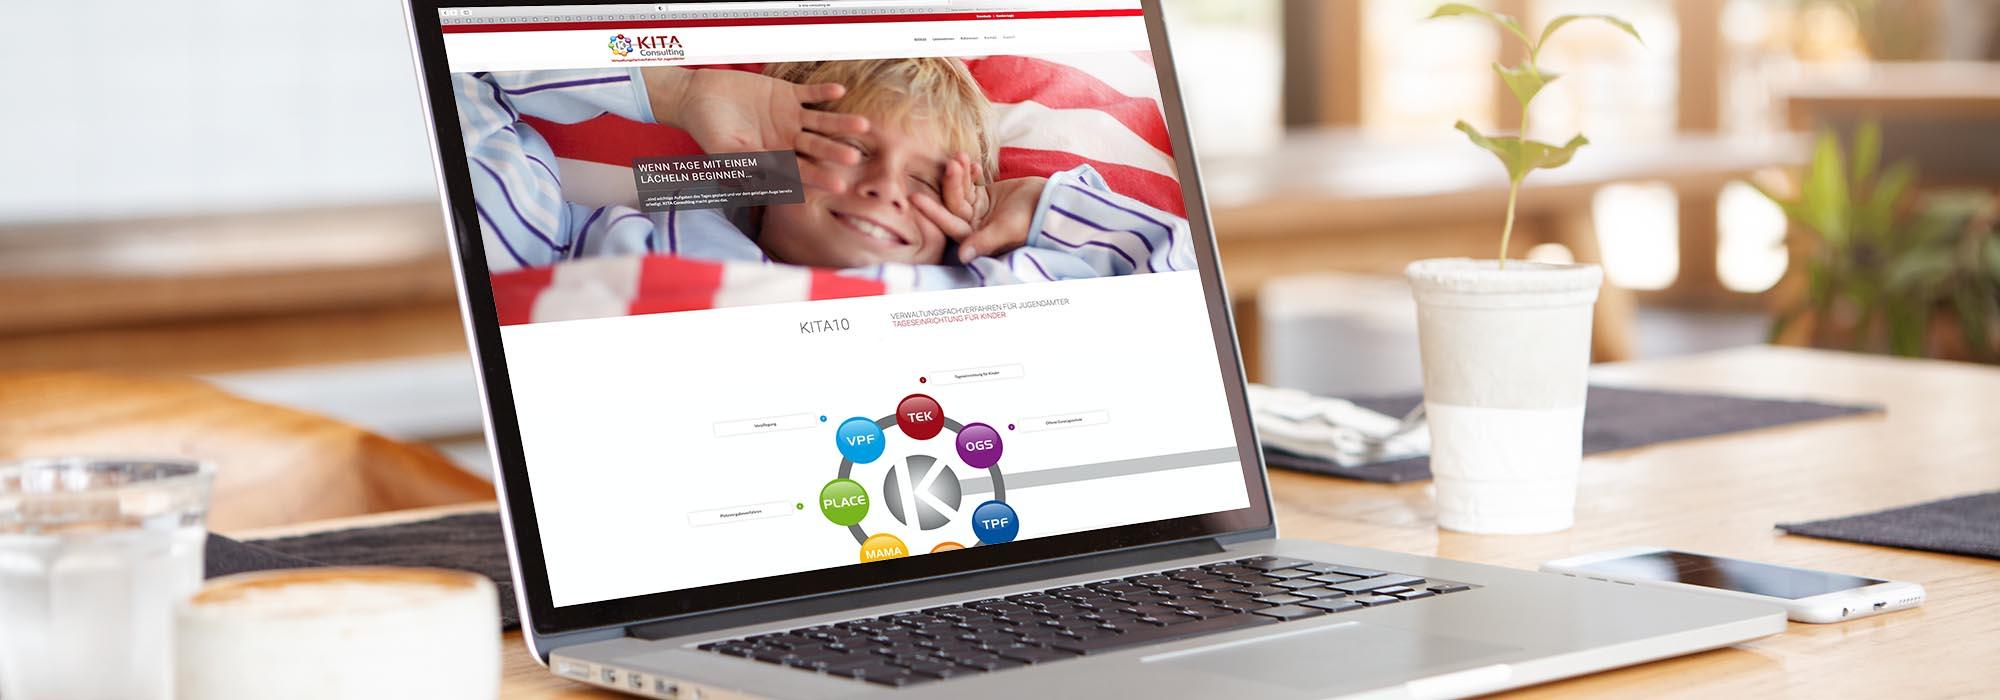 Web | Werbeagentur Siekmann